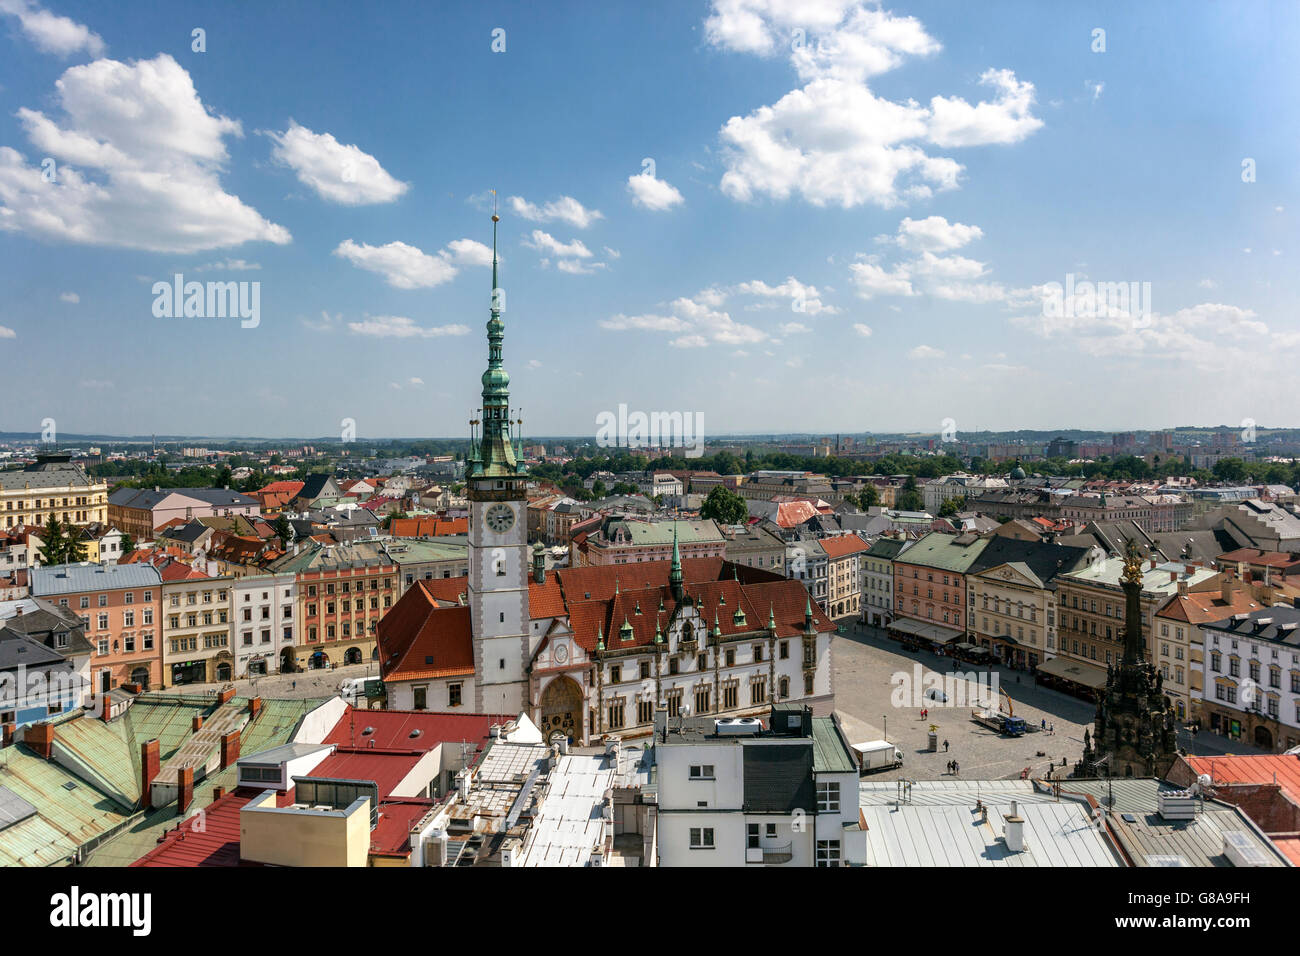 Cityscape Olomouc  Czech Republic, Europe - Stock Image